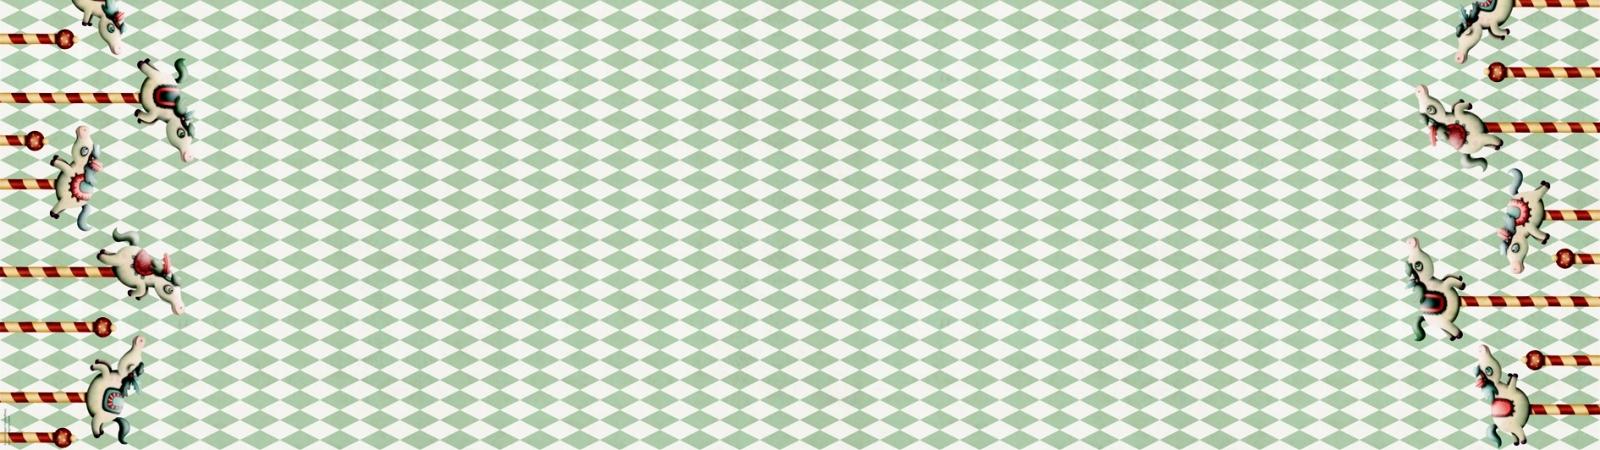 paardjes RGB 16 x 5 lang banner finchfabrics-1600x450